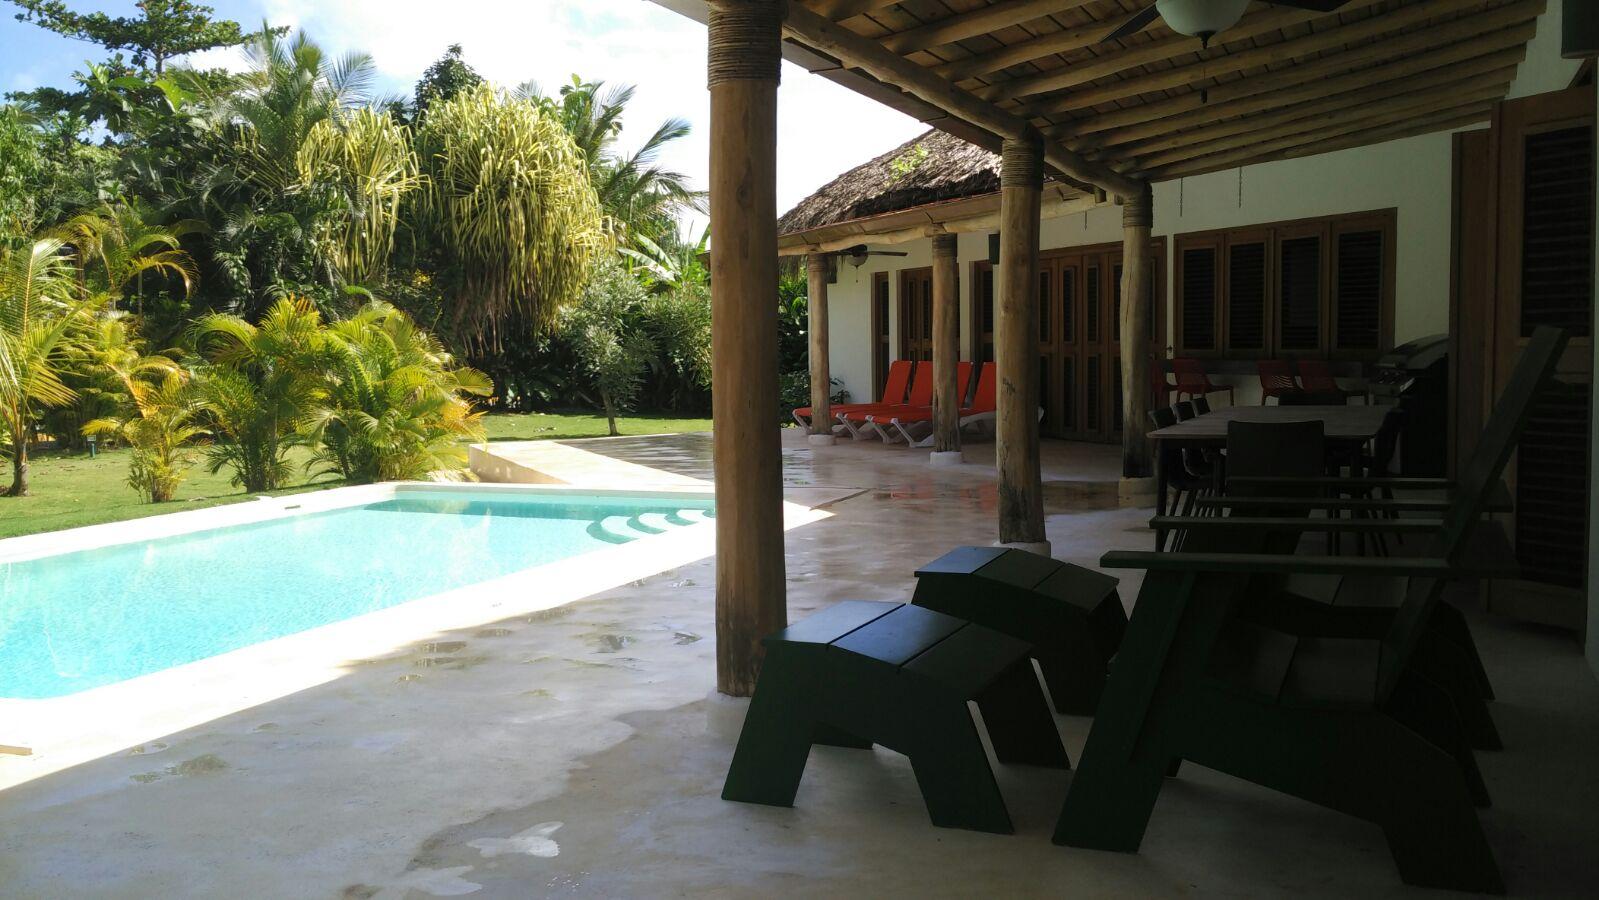 Villa for rent Las Terrenas Cote ci cote la5.jpeg